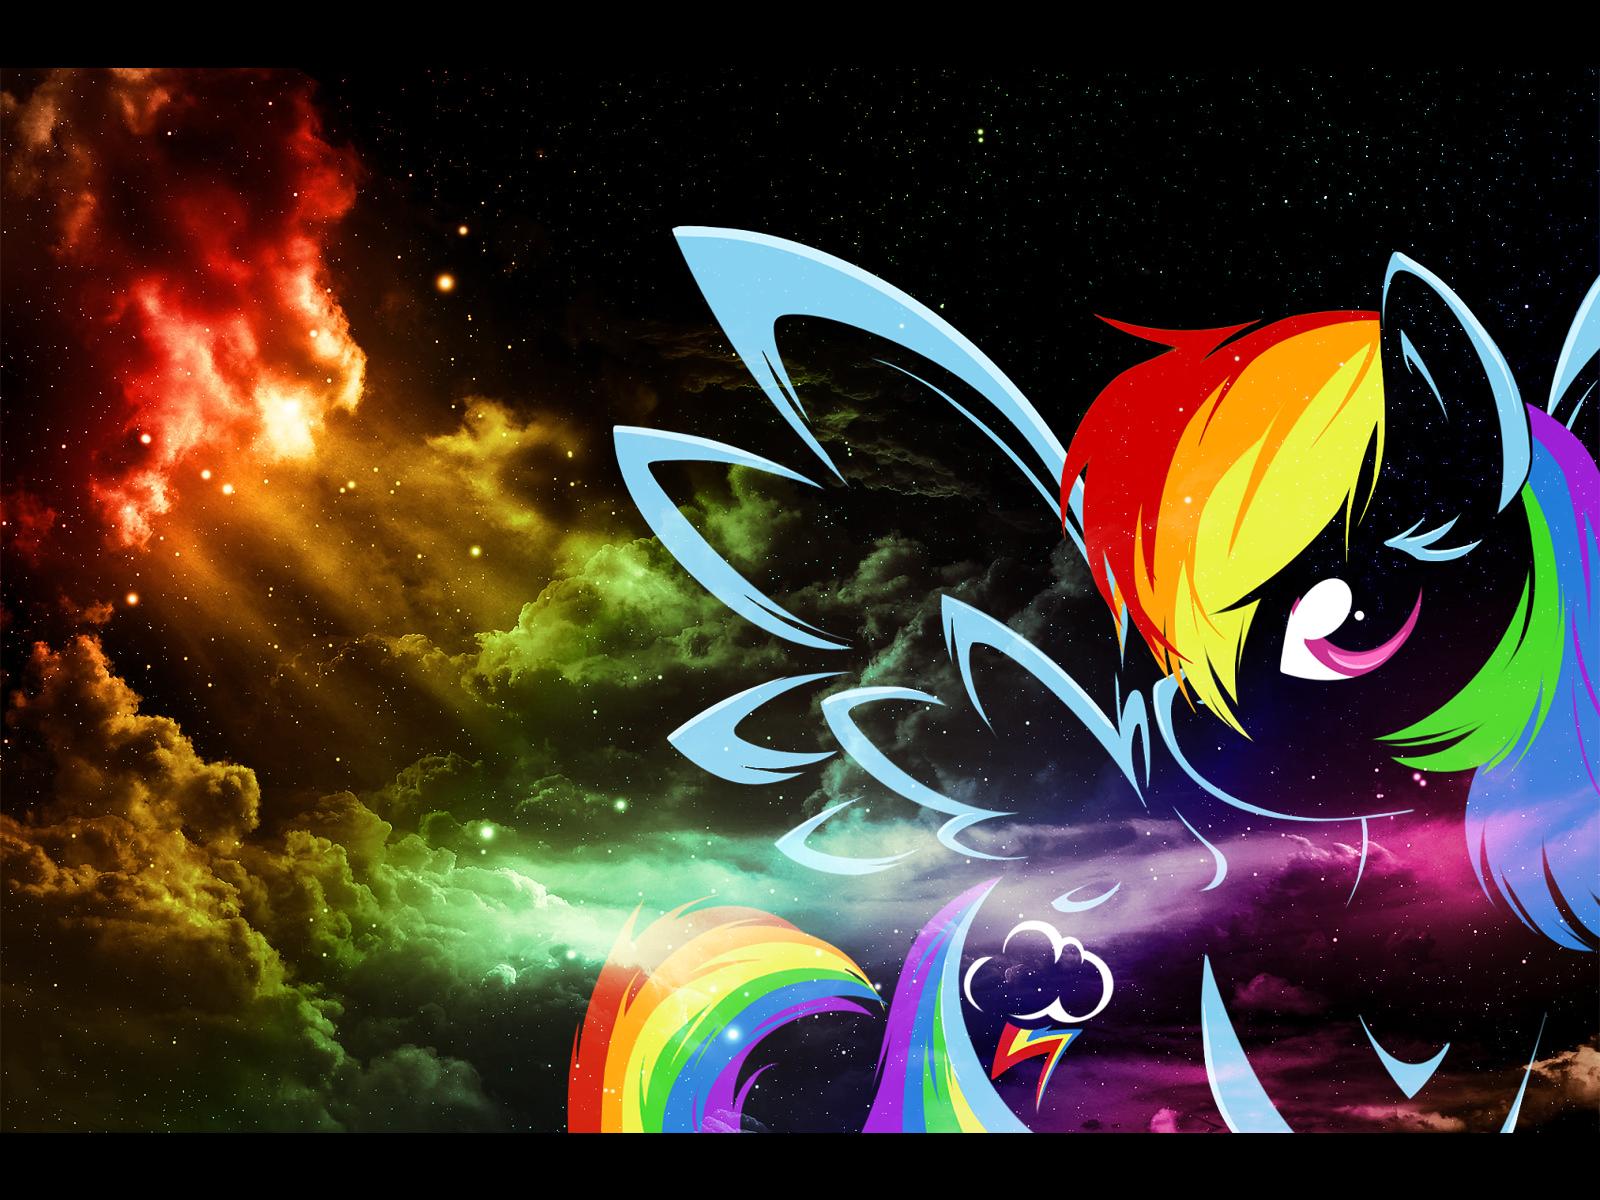 Rainbow Dash | My little pony wallpaper, Cartoon wallpaper ...